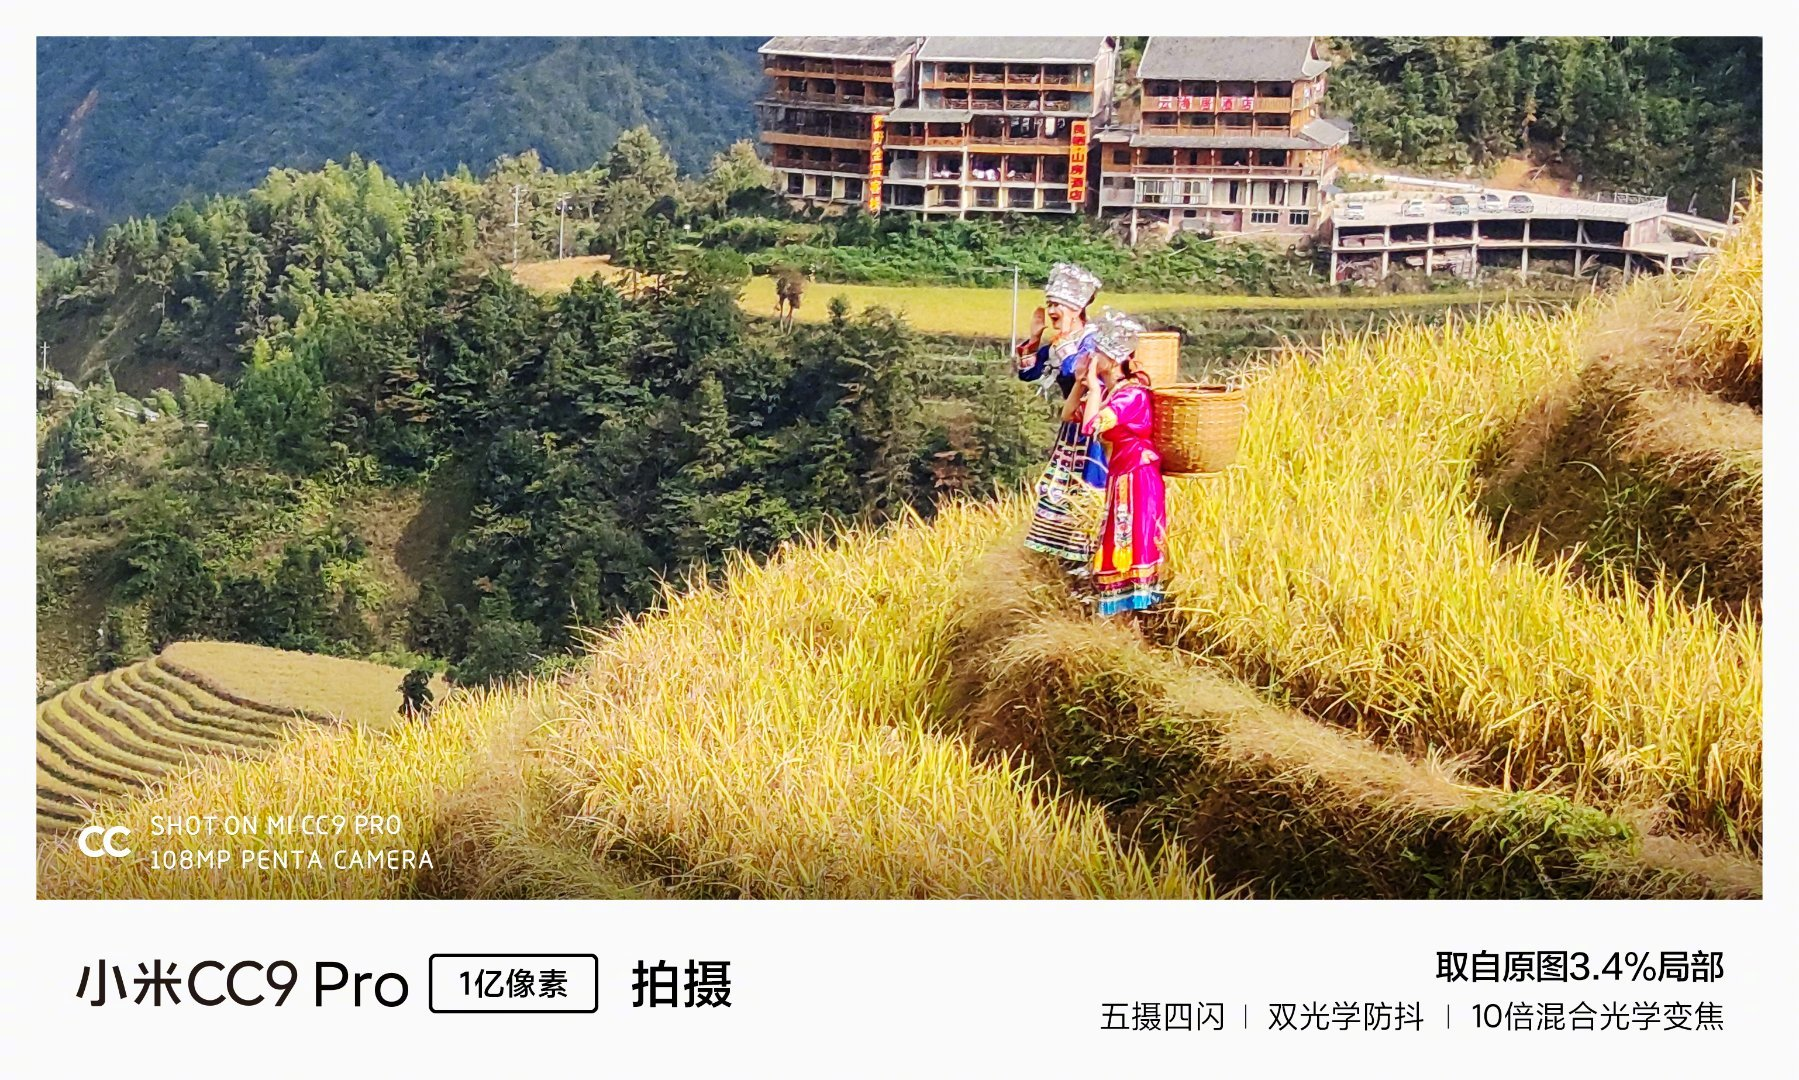 Xiaomi Mi CC9 Pro with 108MP camera launching on November 5